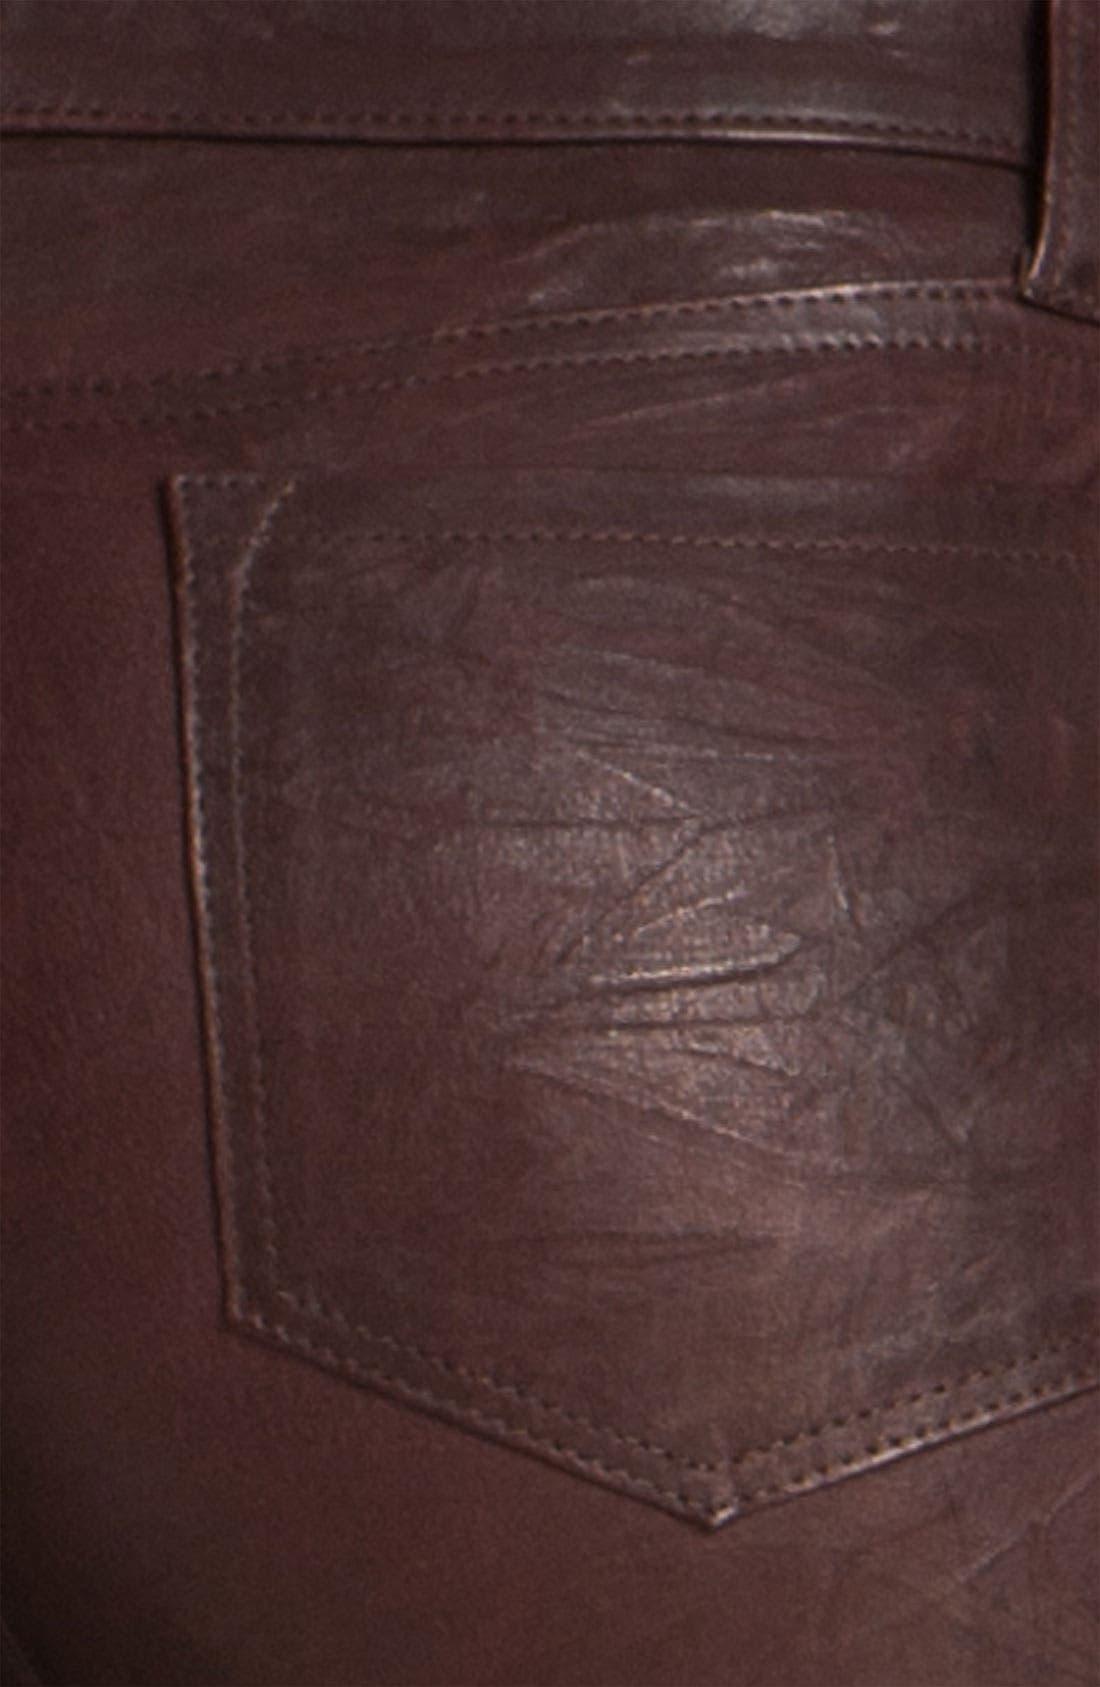 '8001' Lambskin Leather Pants,                             Alternate thumbnail 74, color,